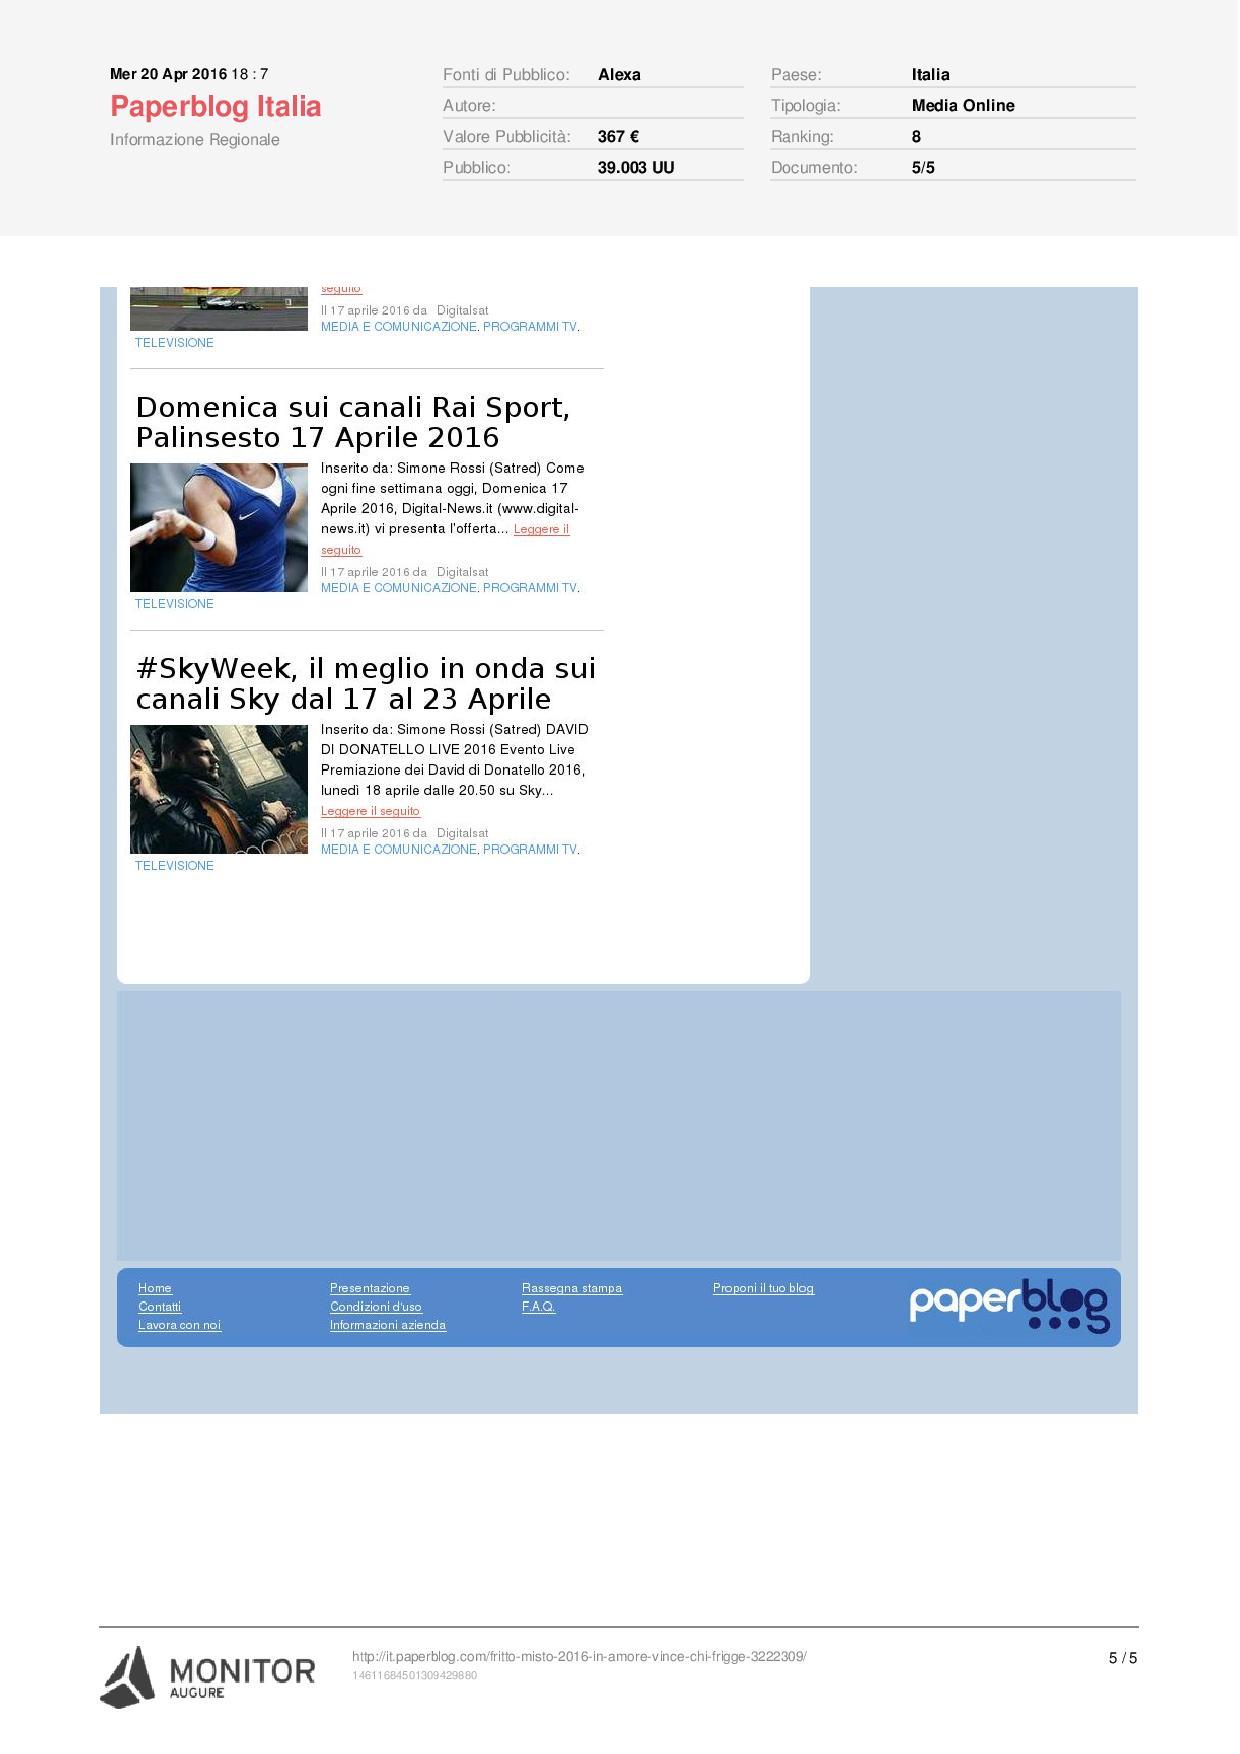 20.04.16_paperblog.com-page-005